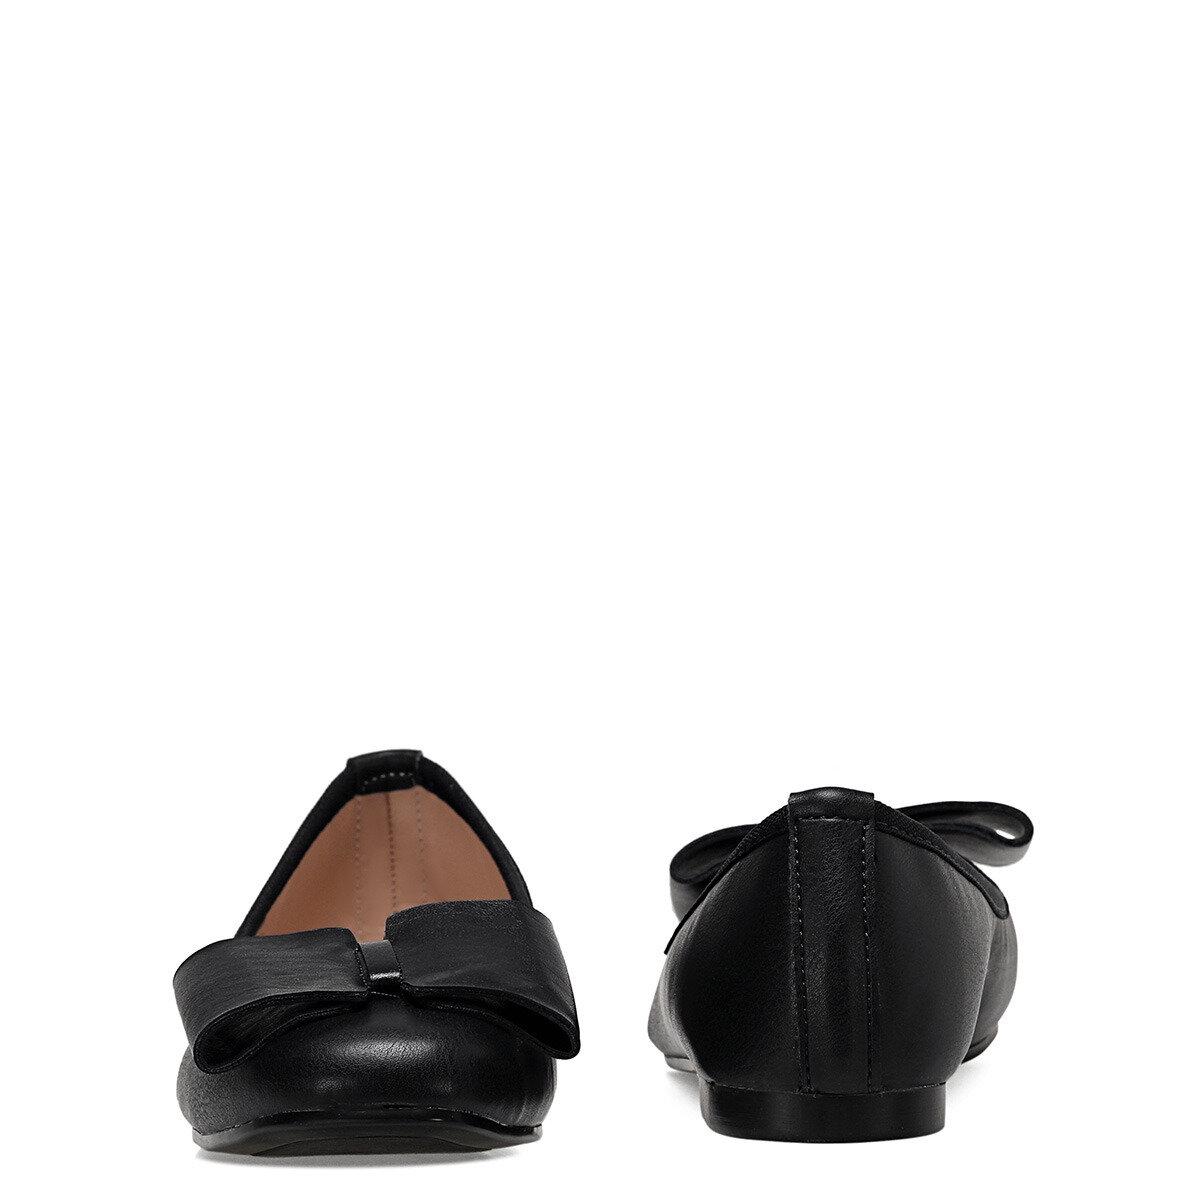 RIWA Siyah Kadın Babet